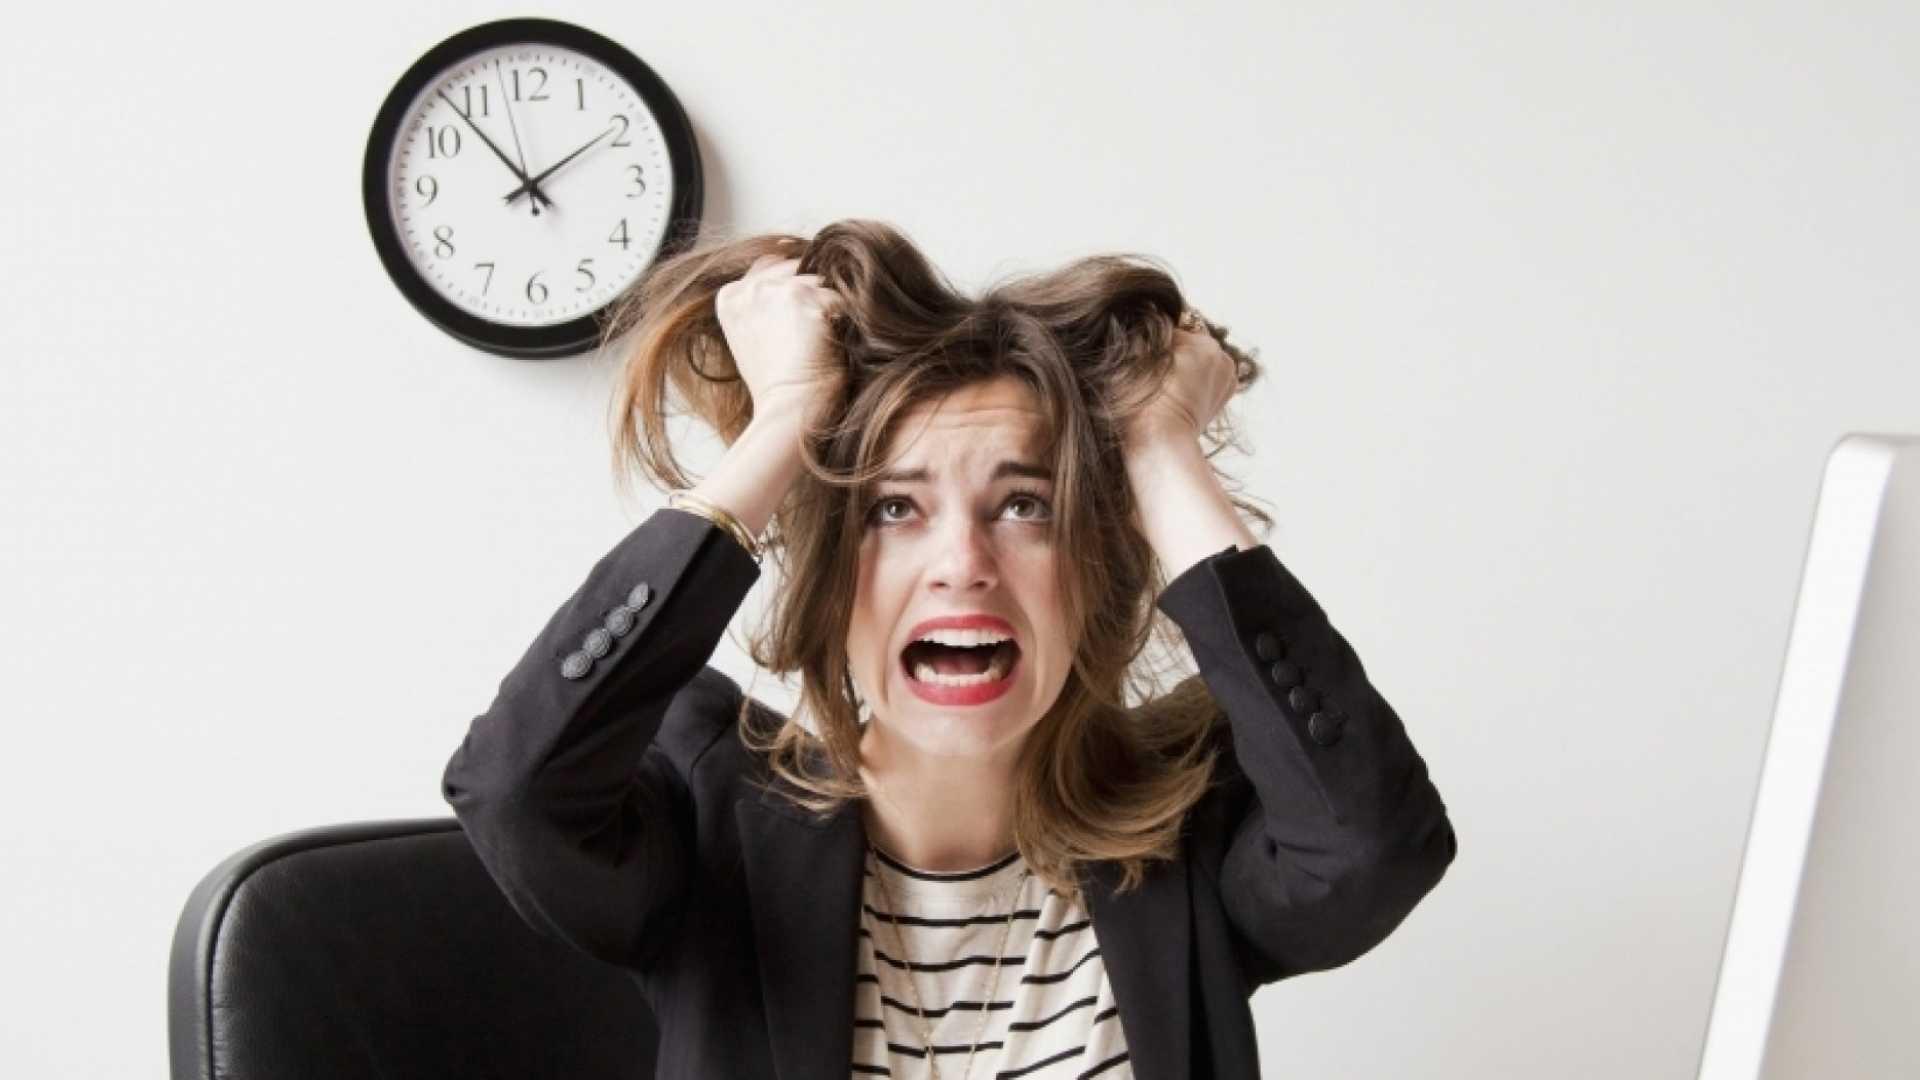 3 Self-Limiting Behaviors That Hinder Your Success